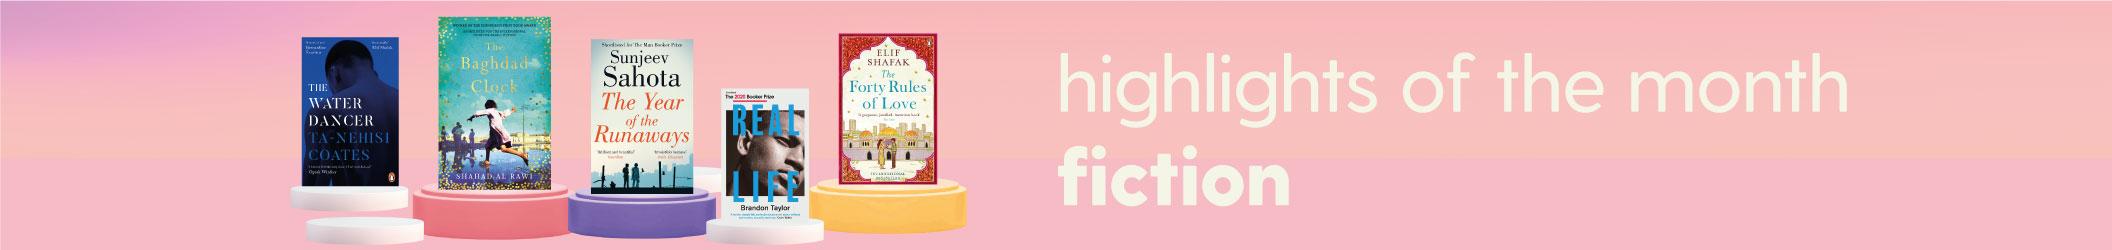 Fiction HOTM 2112x264